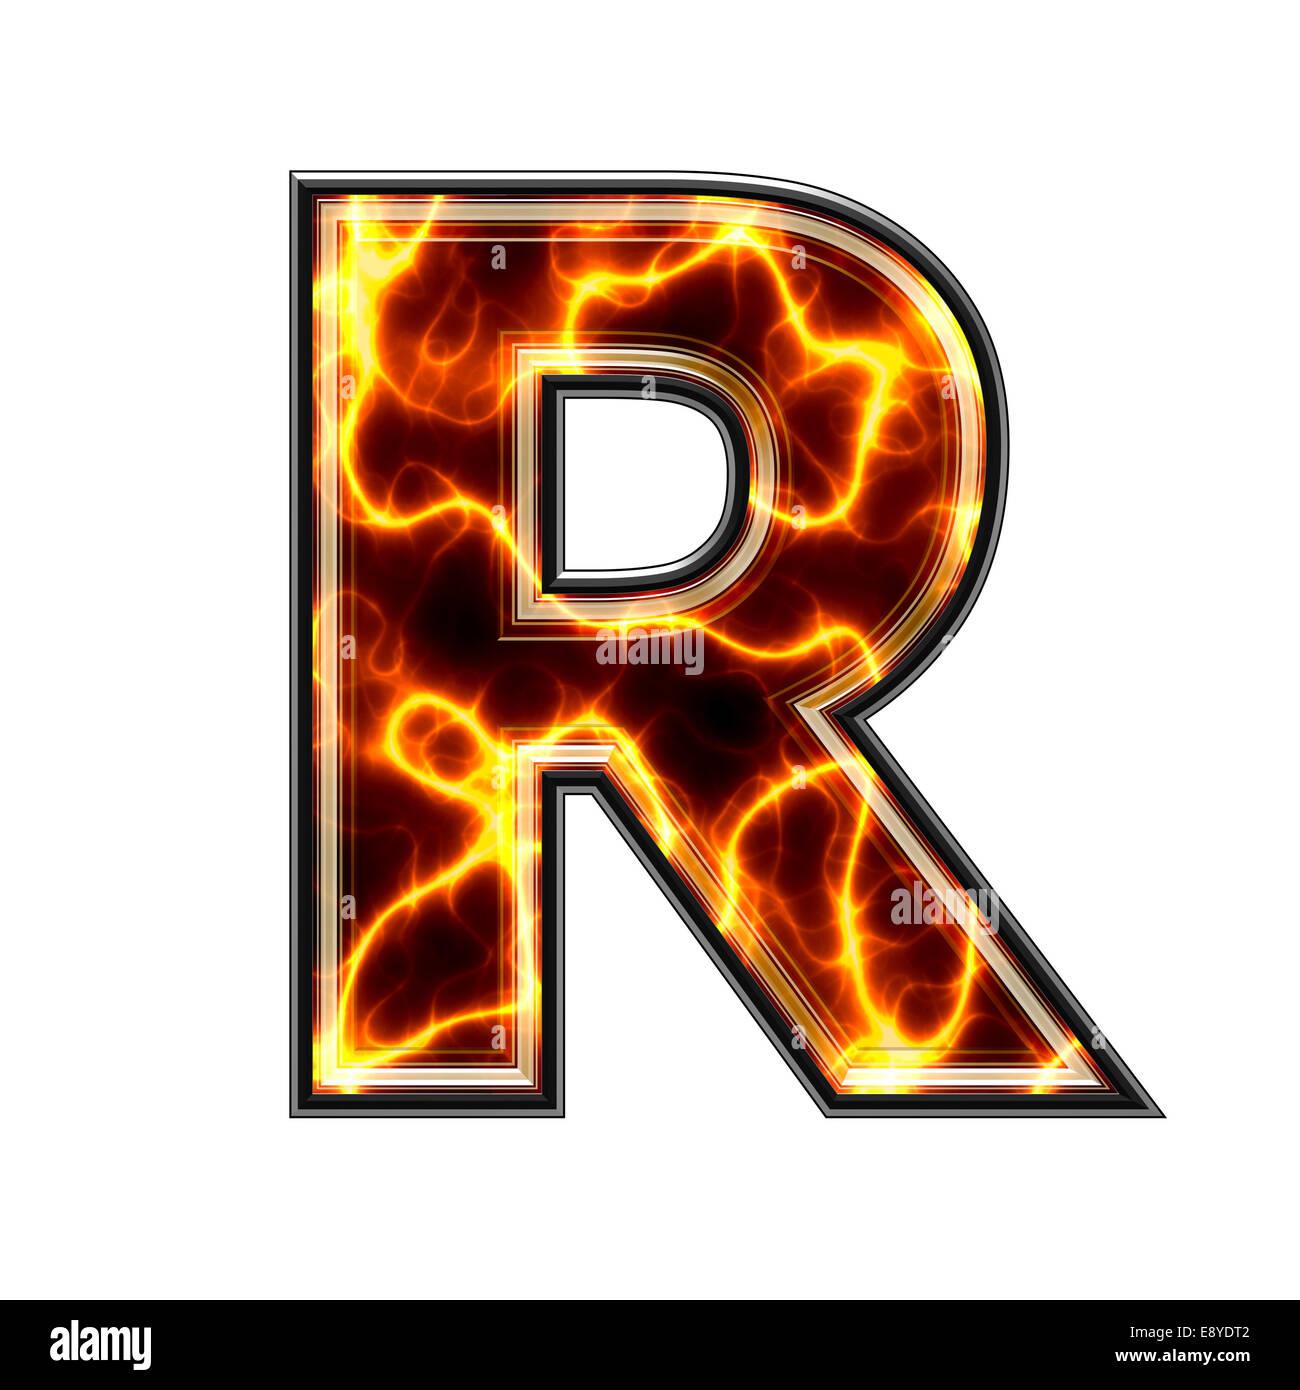 Letter r 3d stock photos letter r 3d stock images alamy 3d electric letter r stock image altavistaventures Image collections